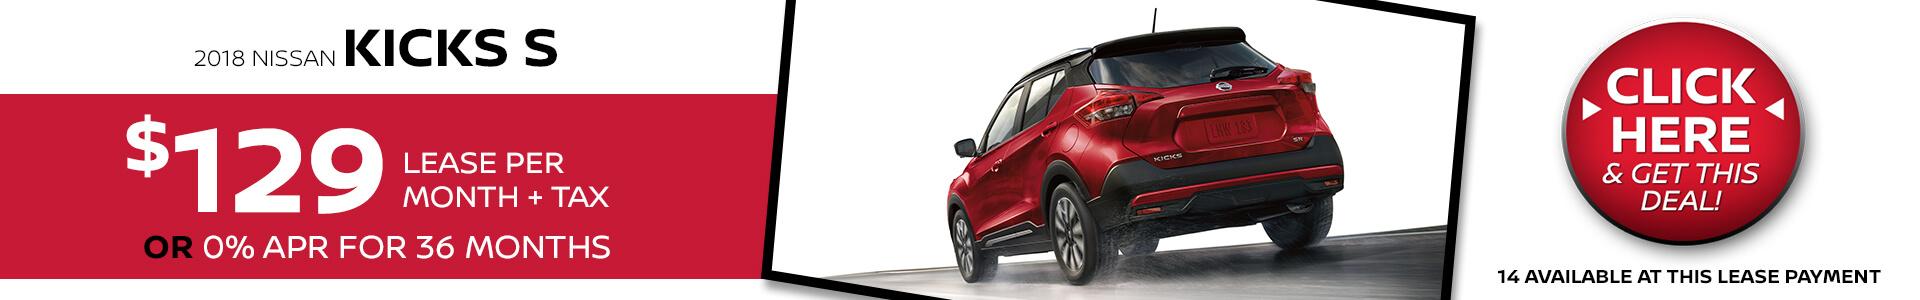 Nissan Kicks $129 Lease